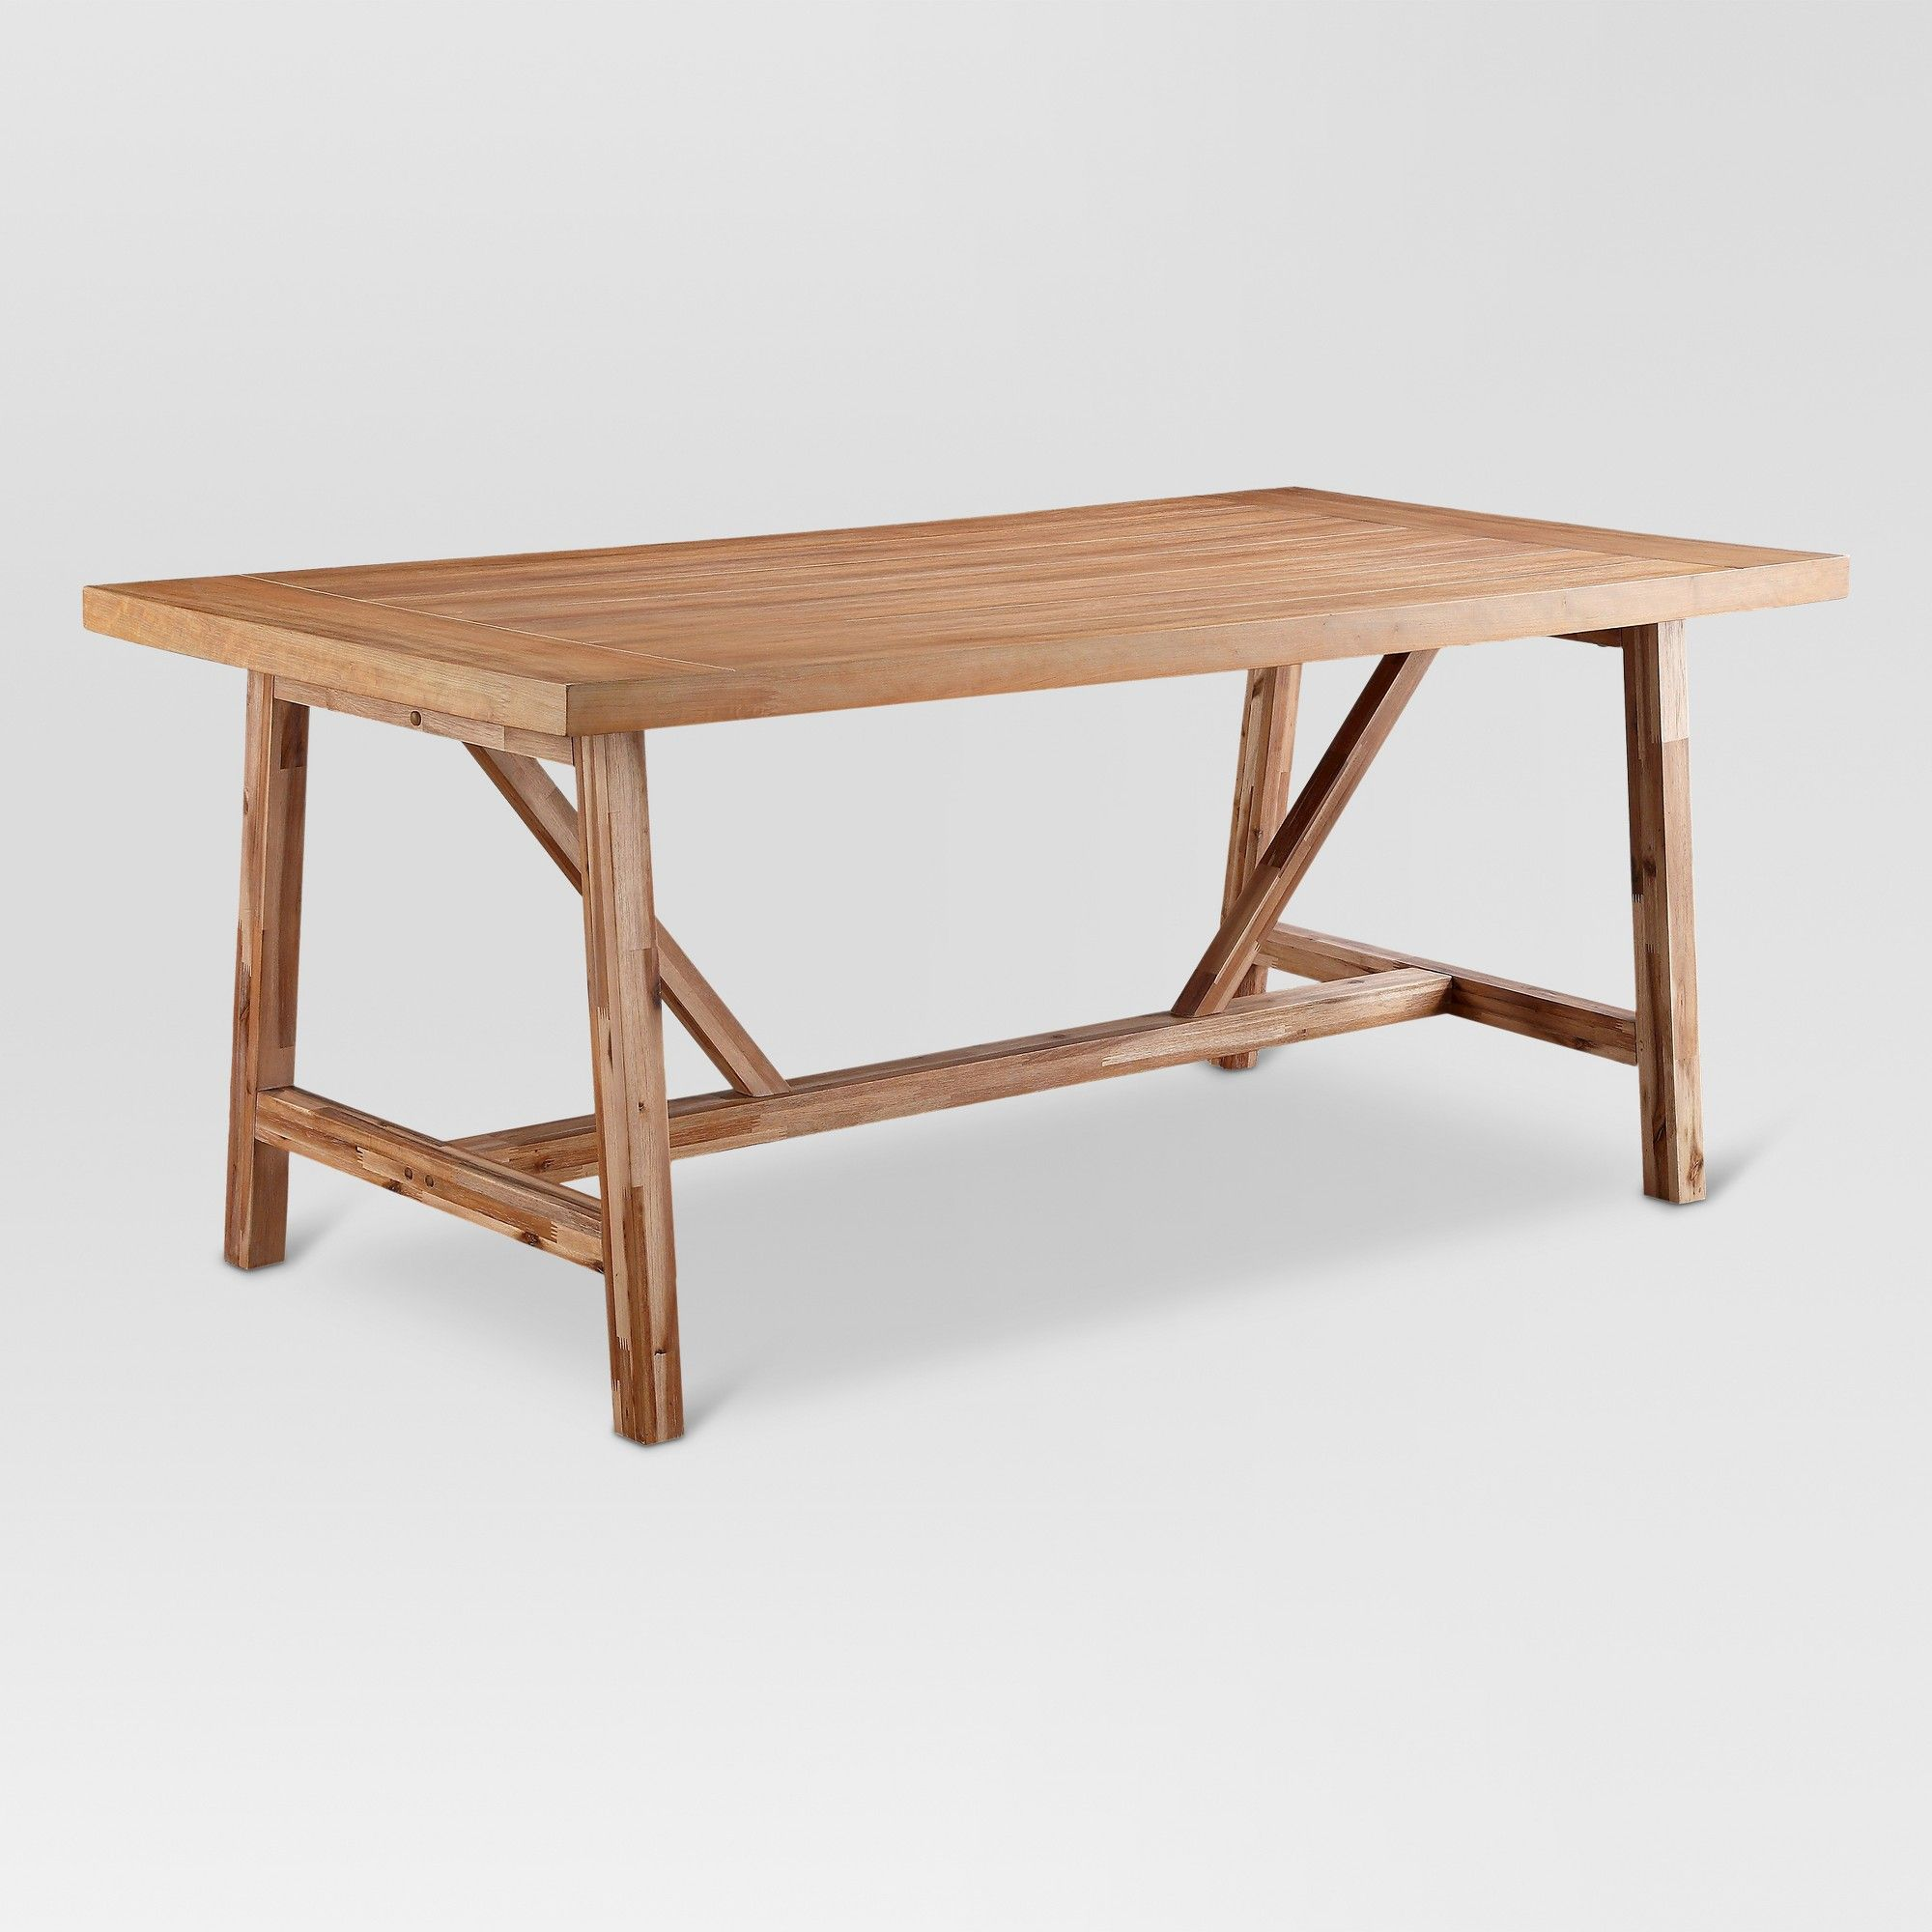 Peachy Wheaton Farmhouse Trestle 60 Dining Table Threshold Brown Alphanode Cool Chair Designs And Ideas Alphanodeonline